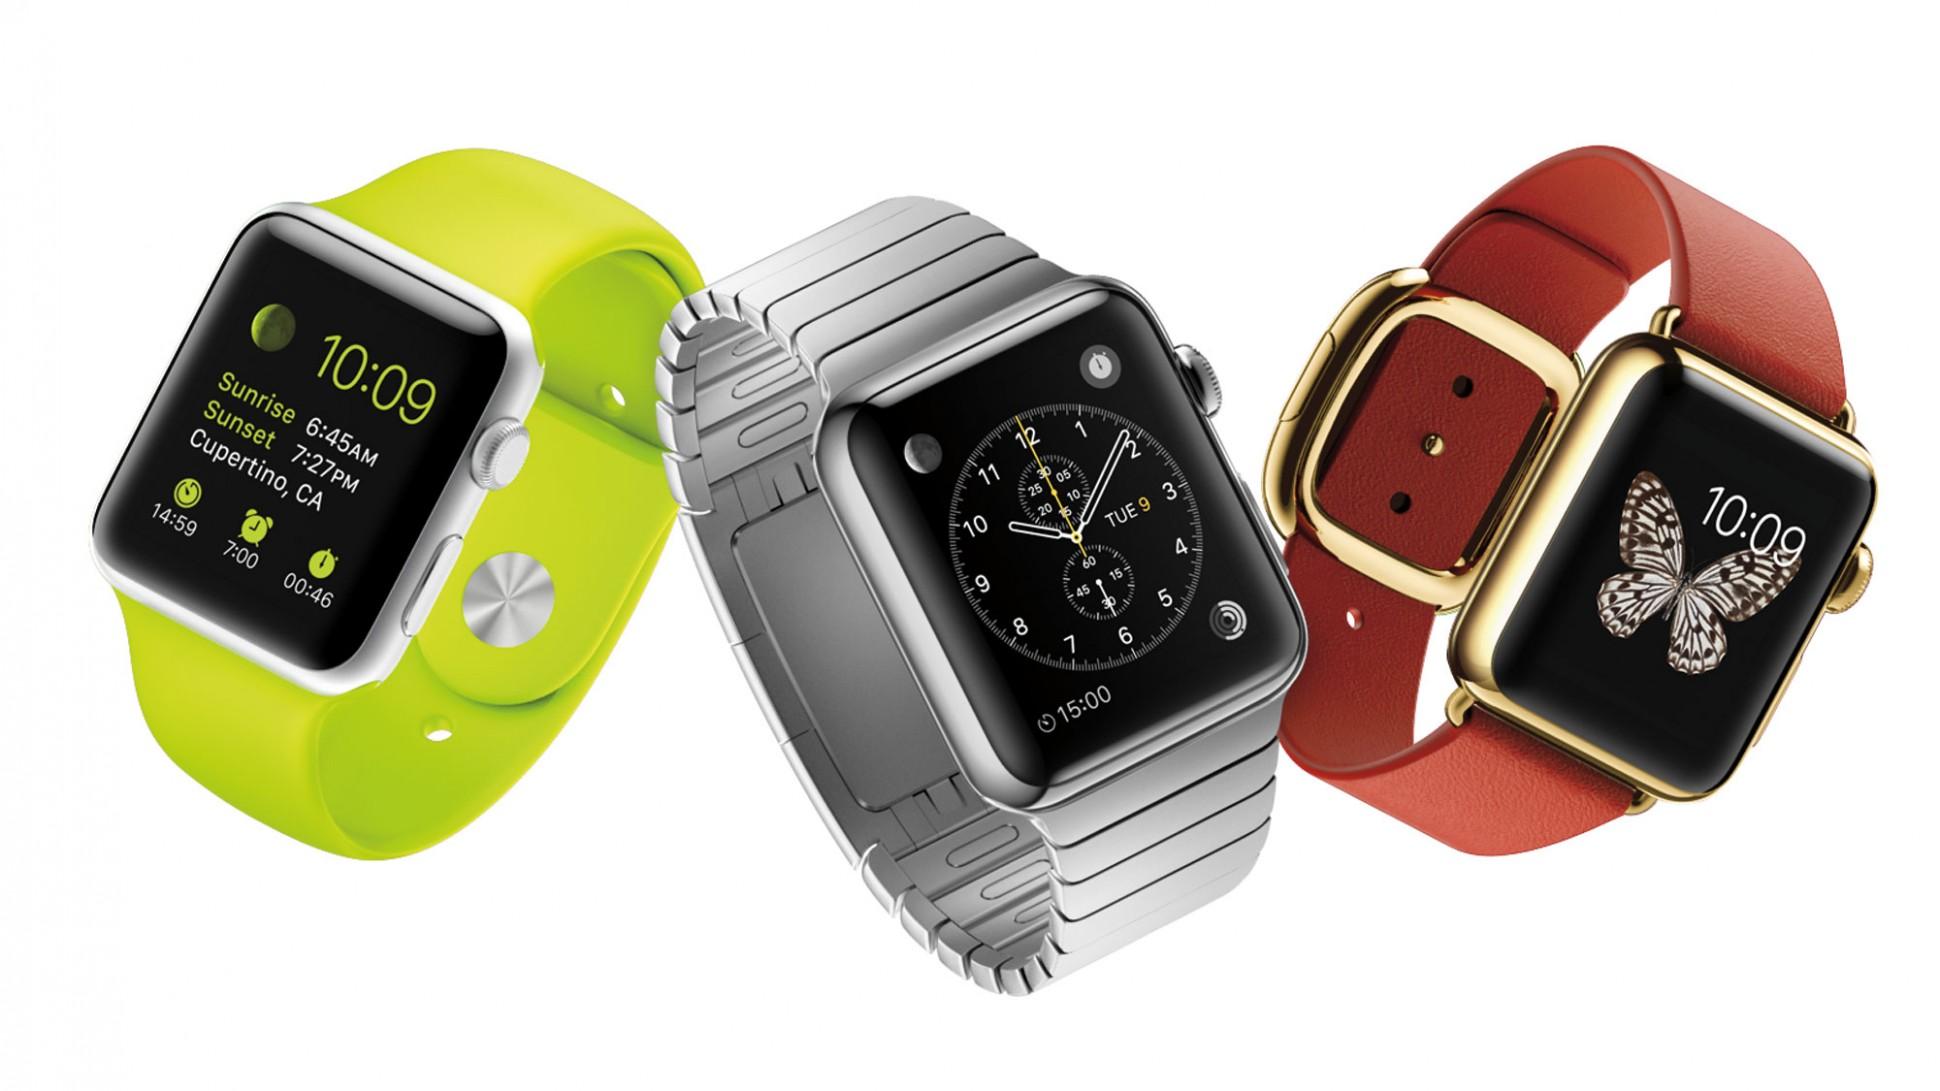 apple-watch-sales-apparently-half-of-original-estimates